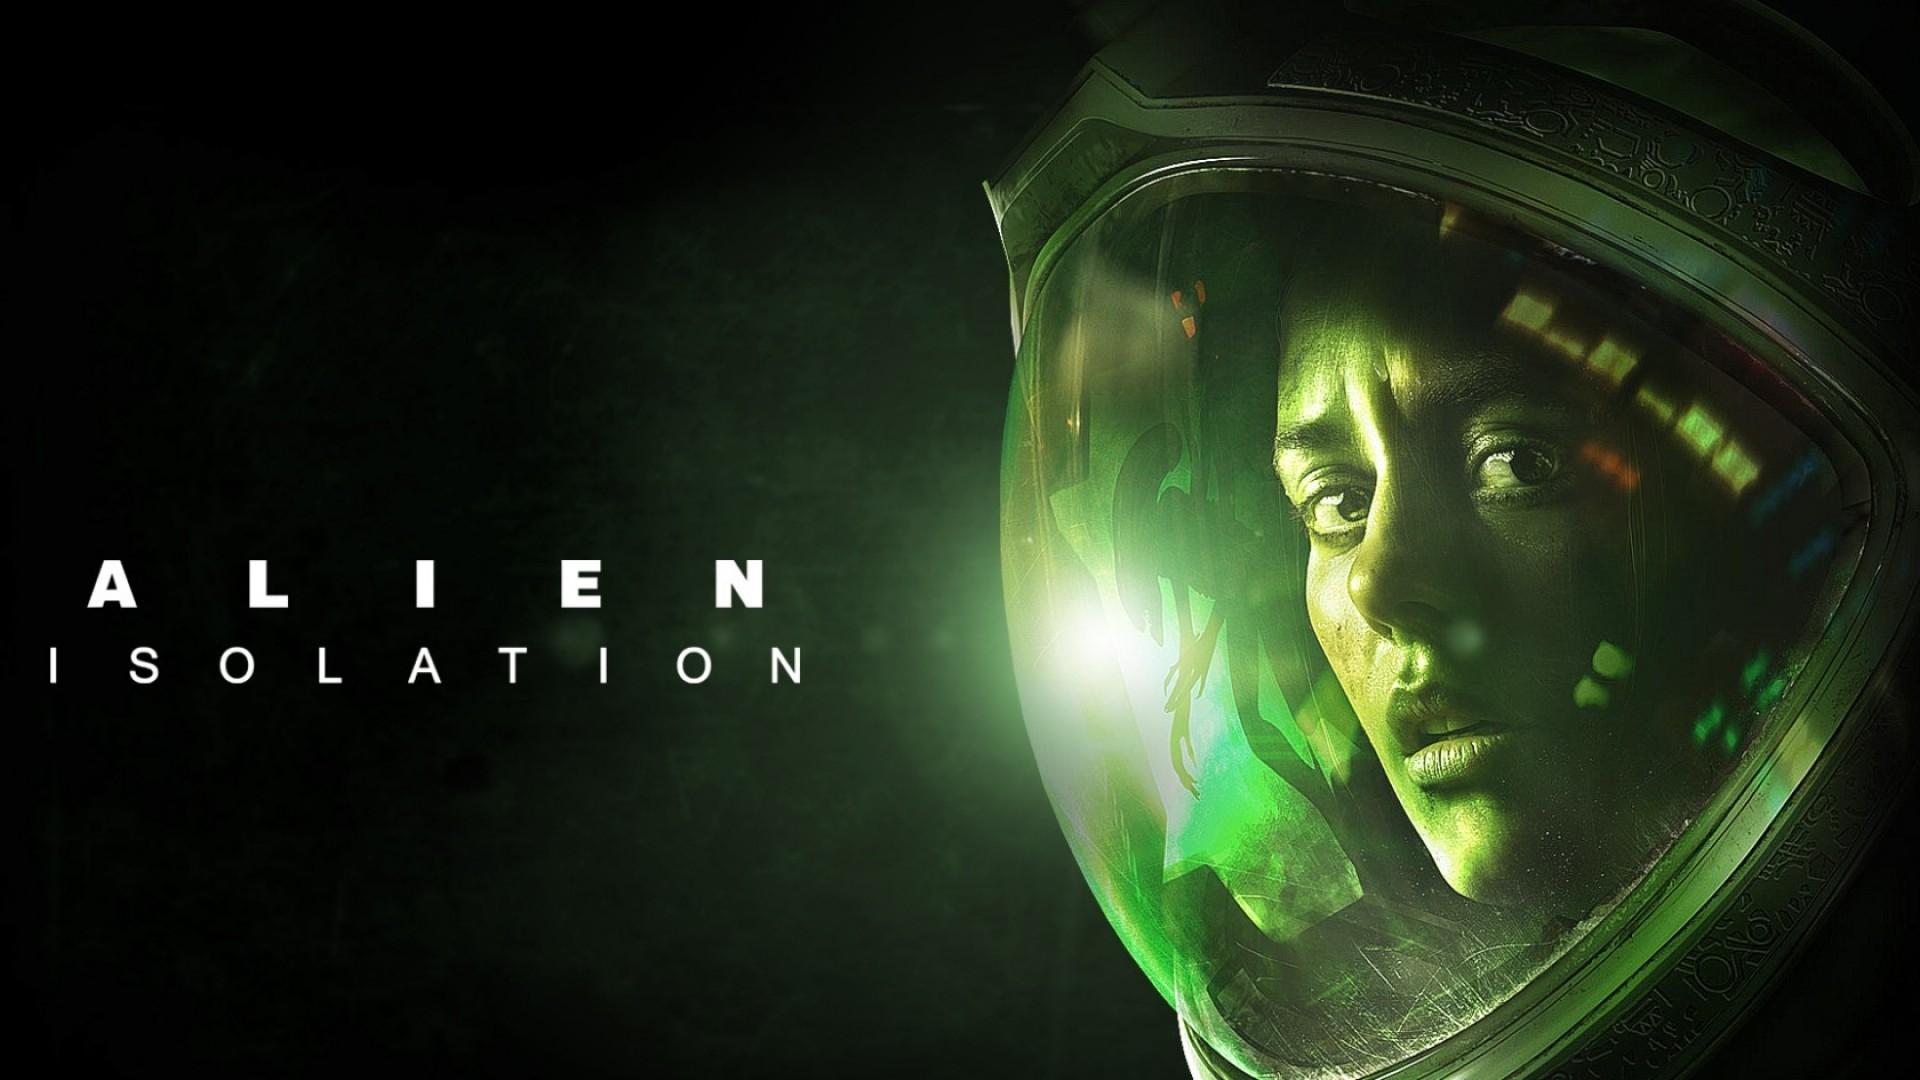 Preview wallpaper alien isolation, game, 2014, ellen ripley, girl 1920×1080